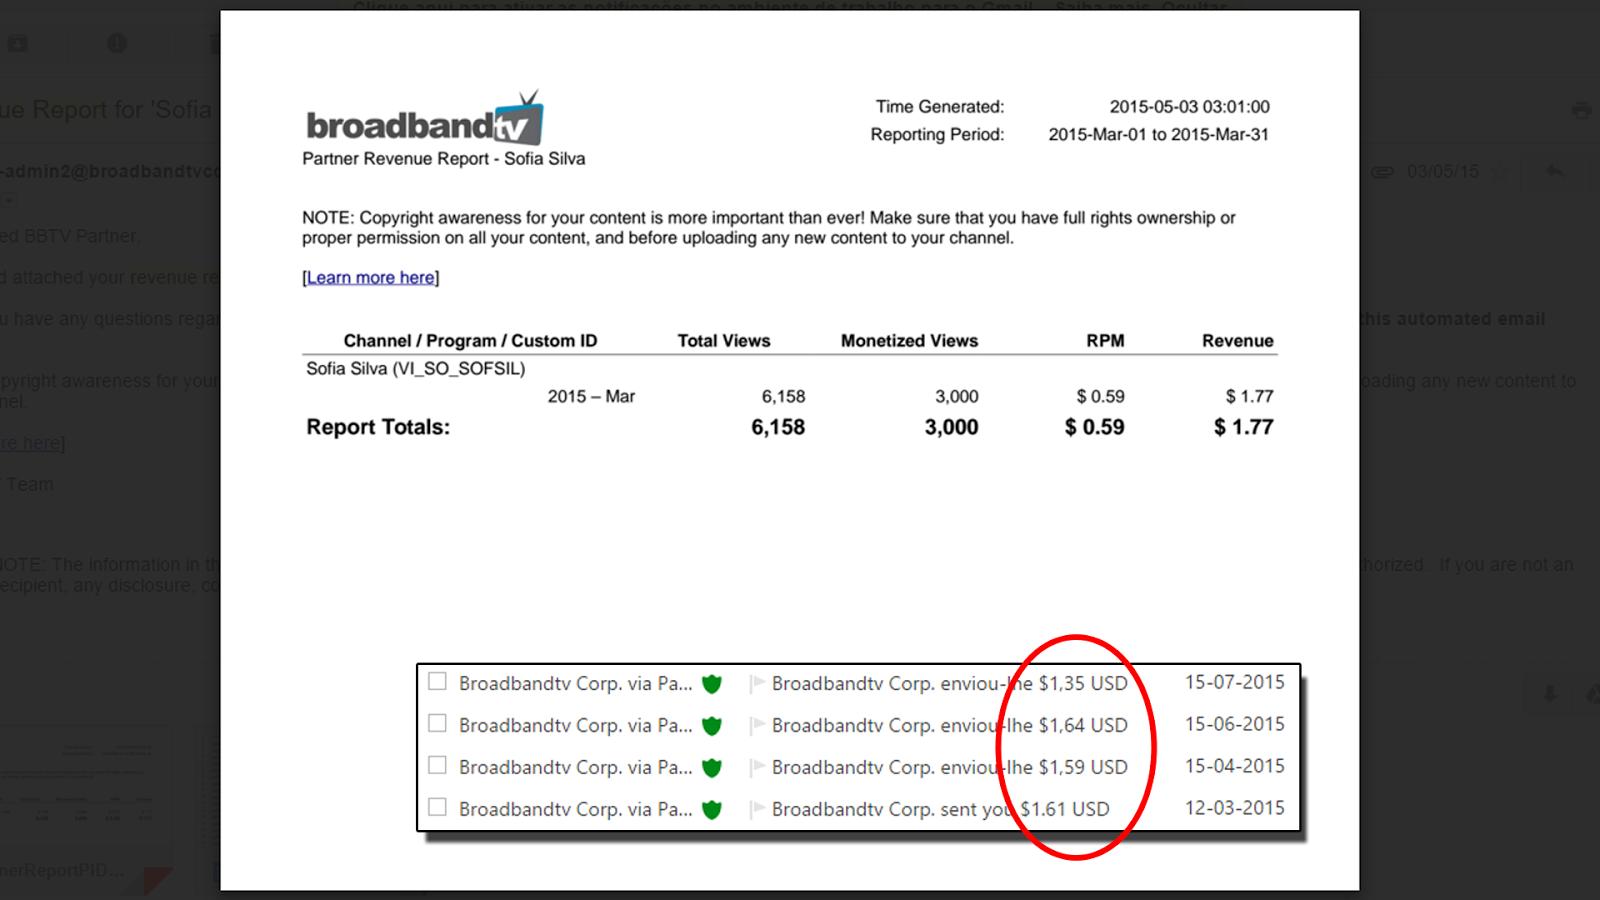 My Partner Revenue Report